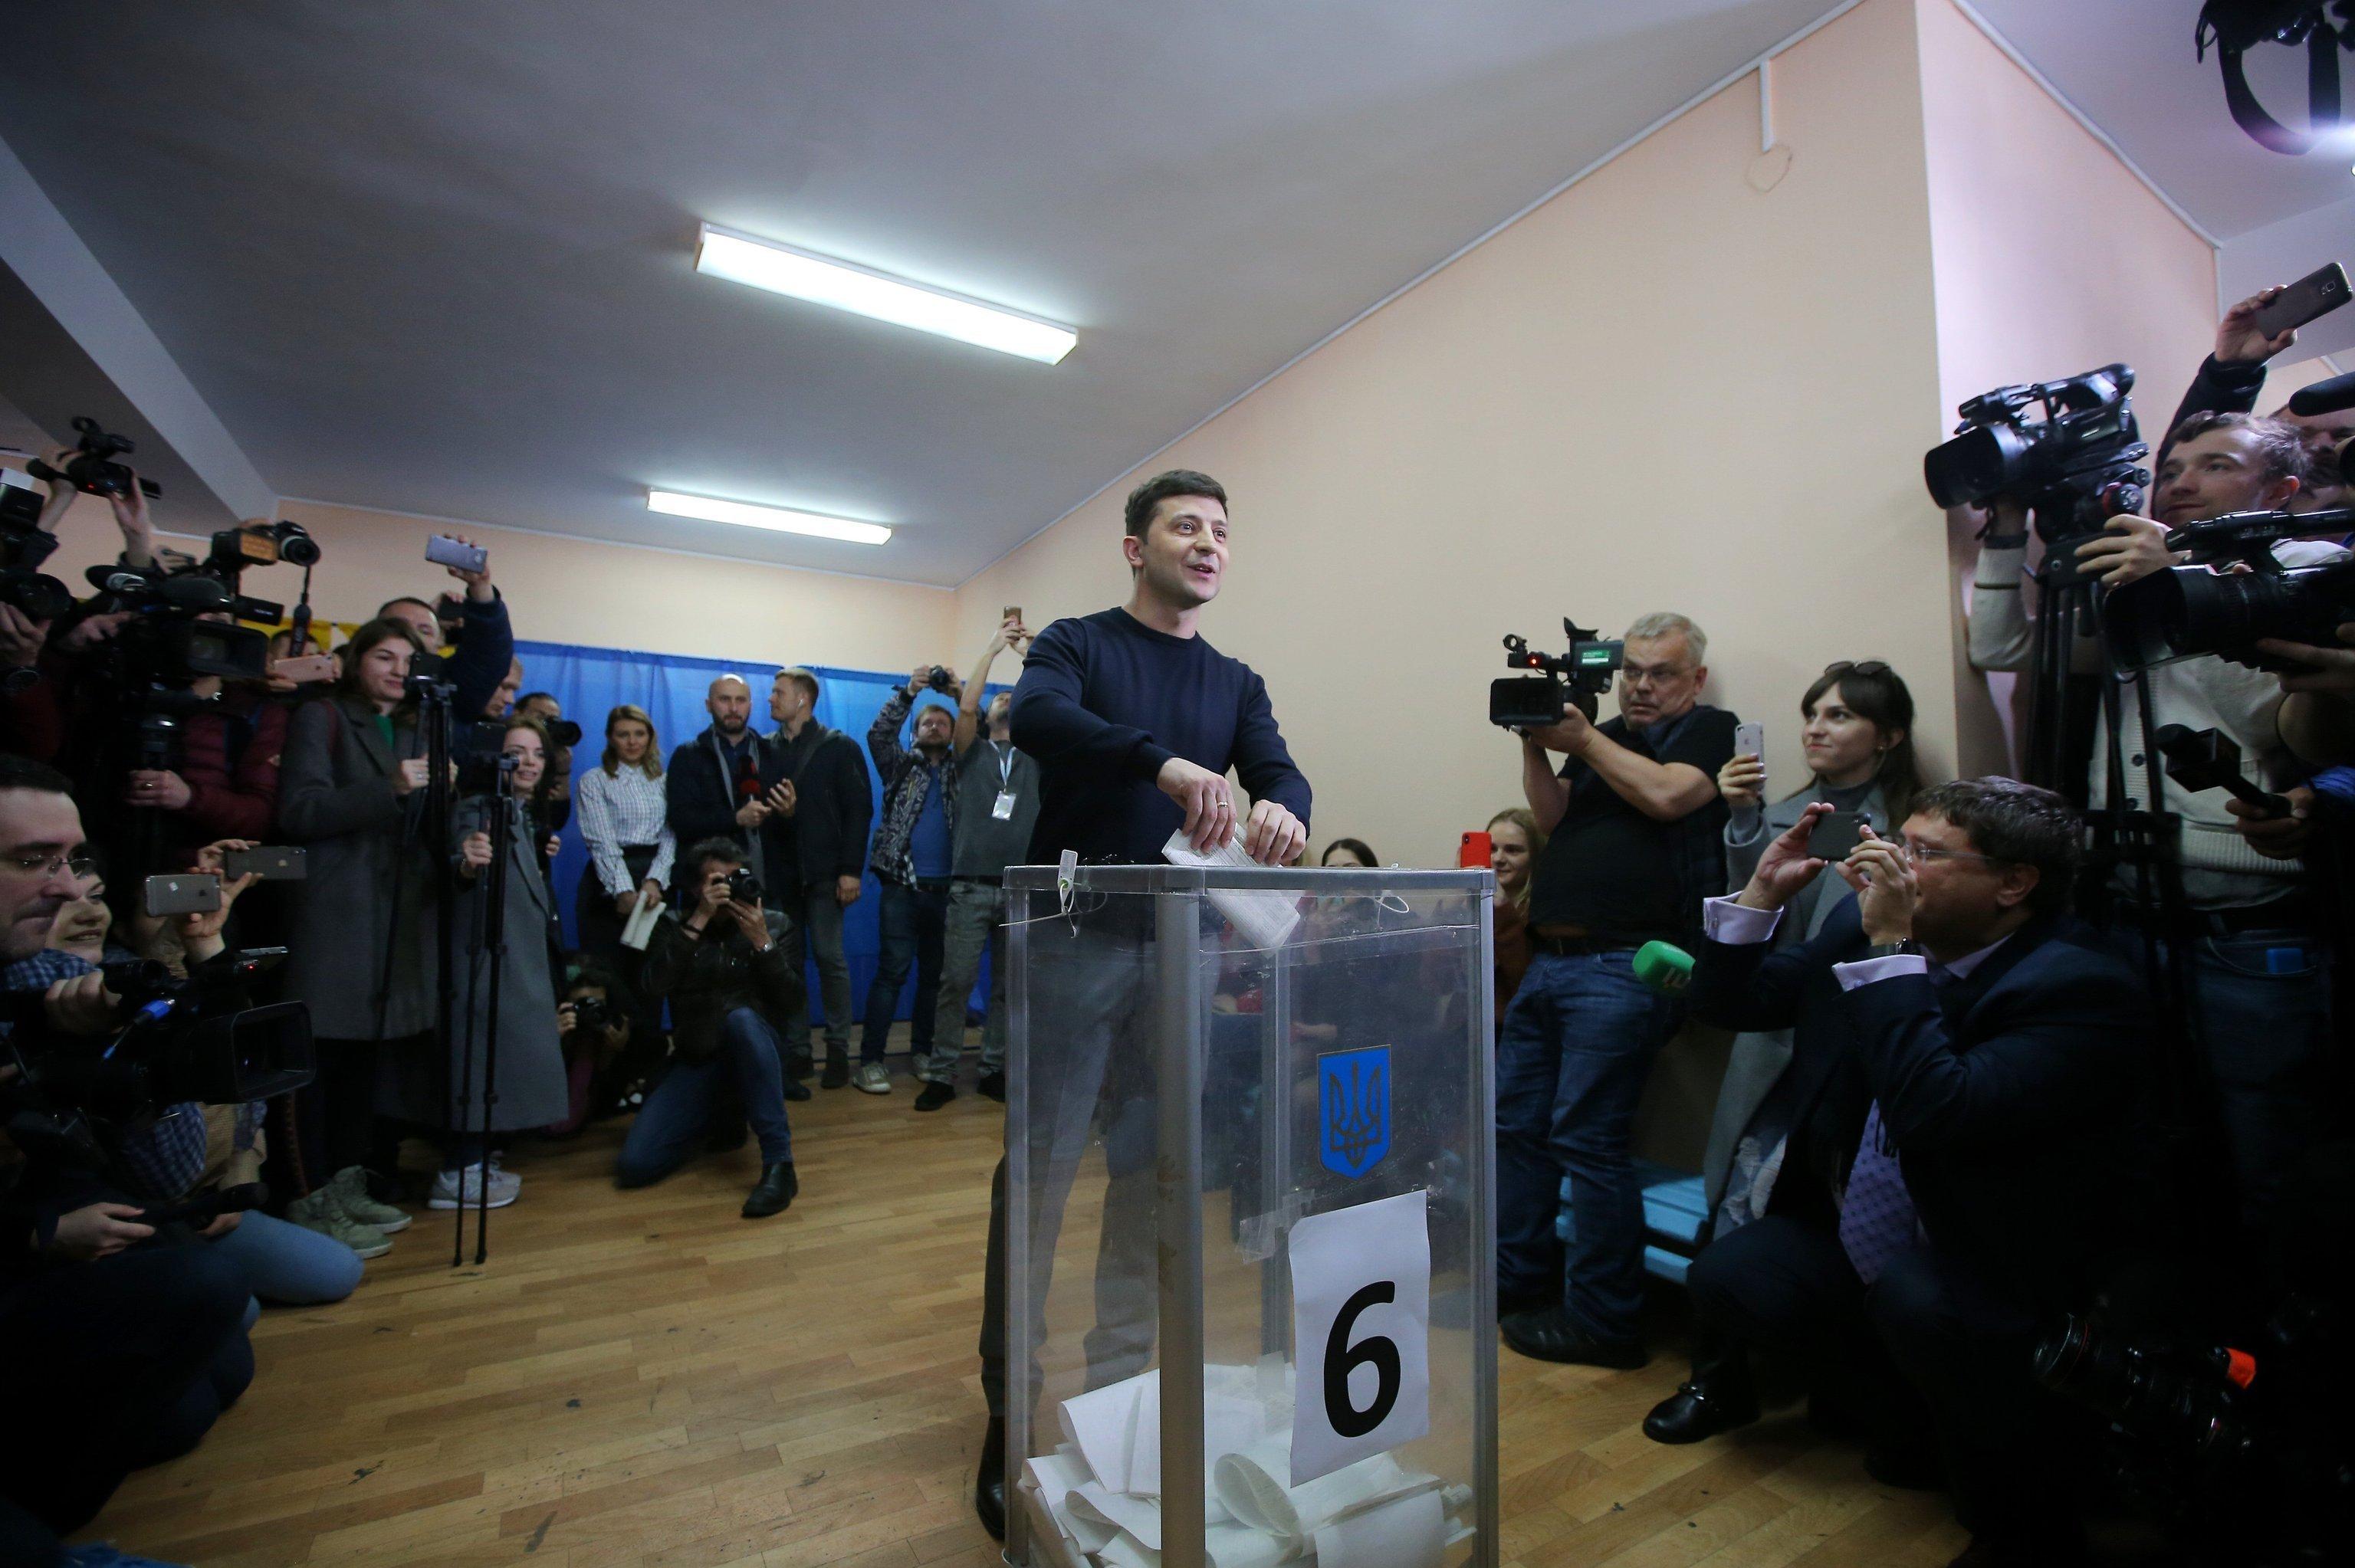 Zelensky votes in the election.